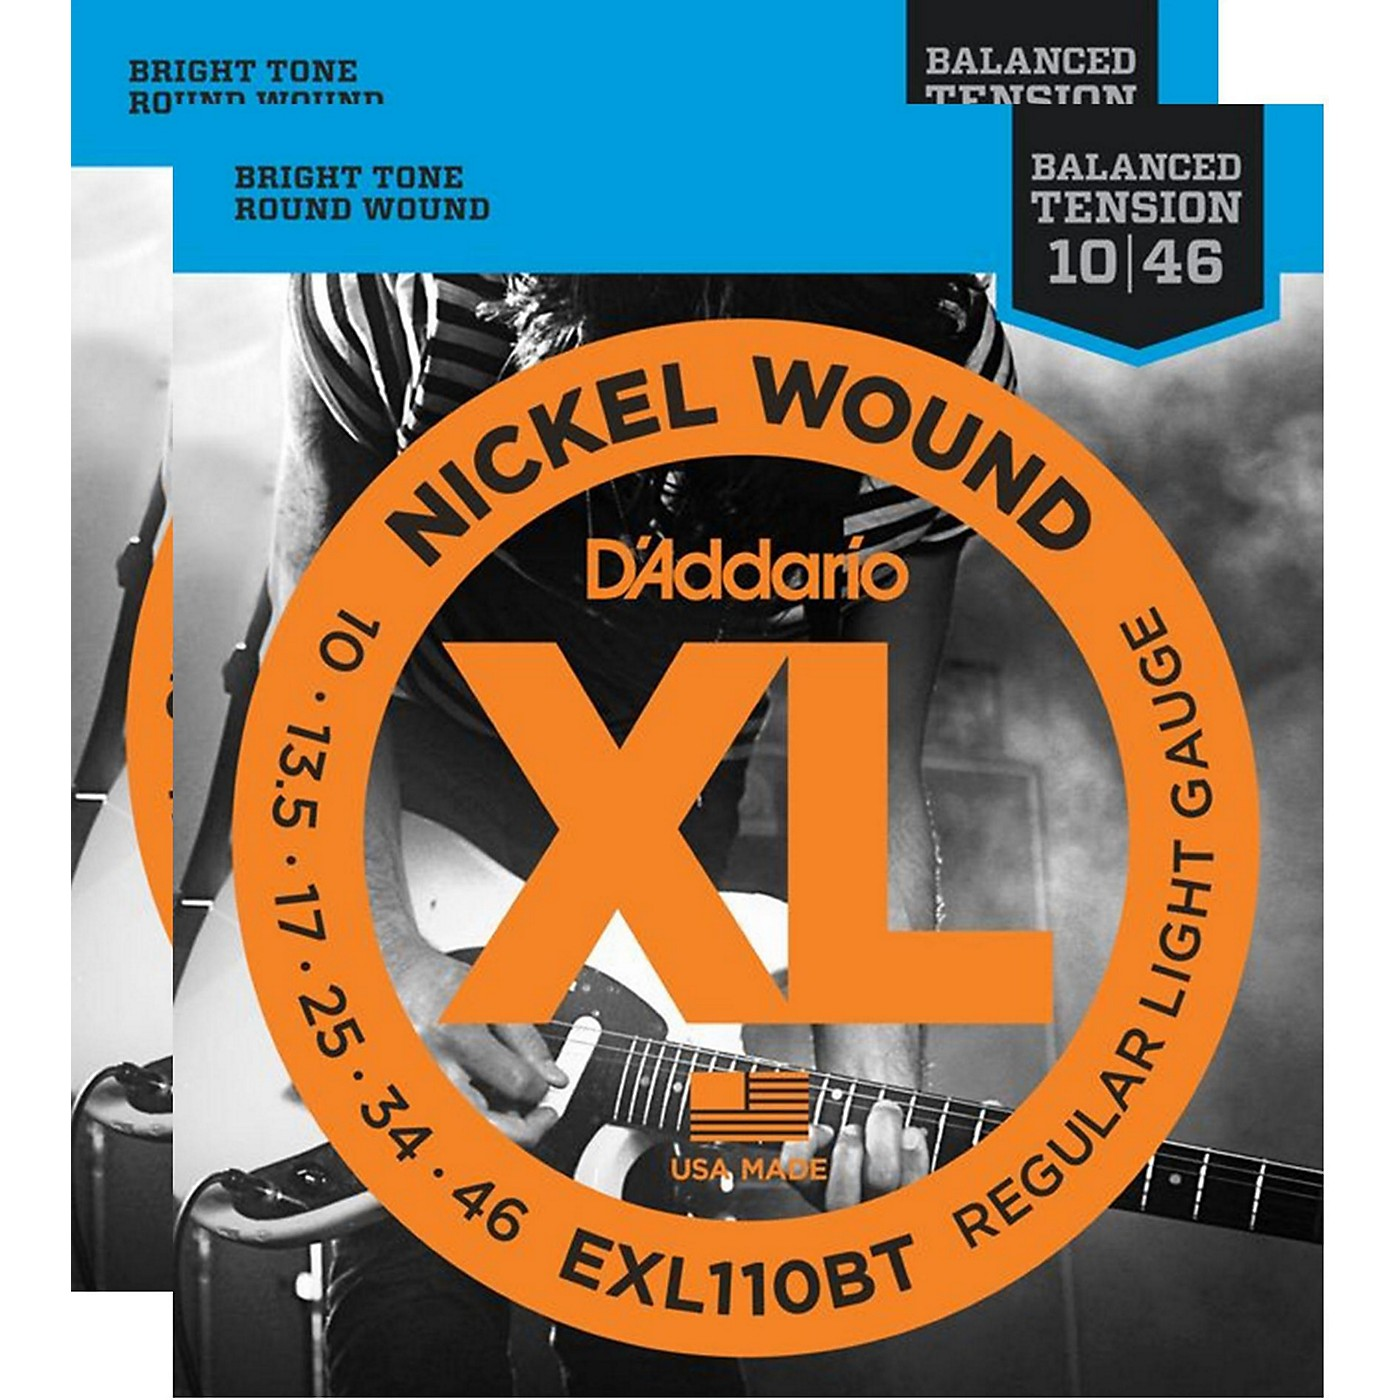 D'Addario EXL110BT Balanced Tension Lite Electric Guitar Strings (2-Pack) thumbnail